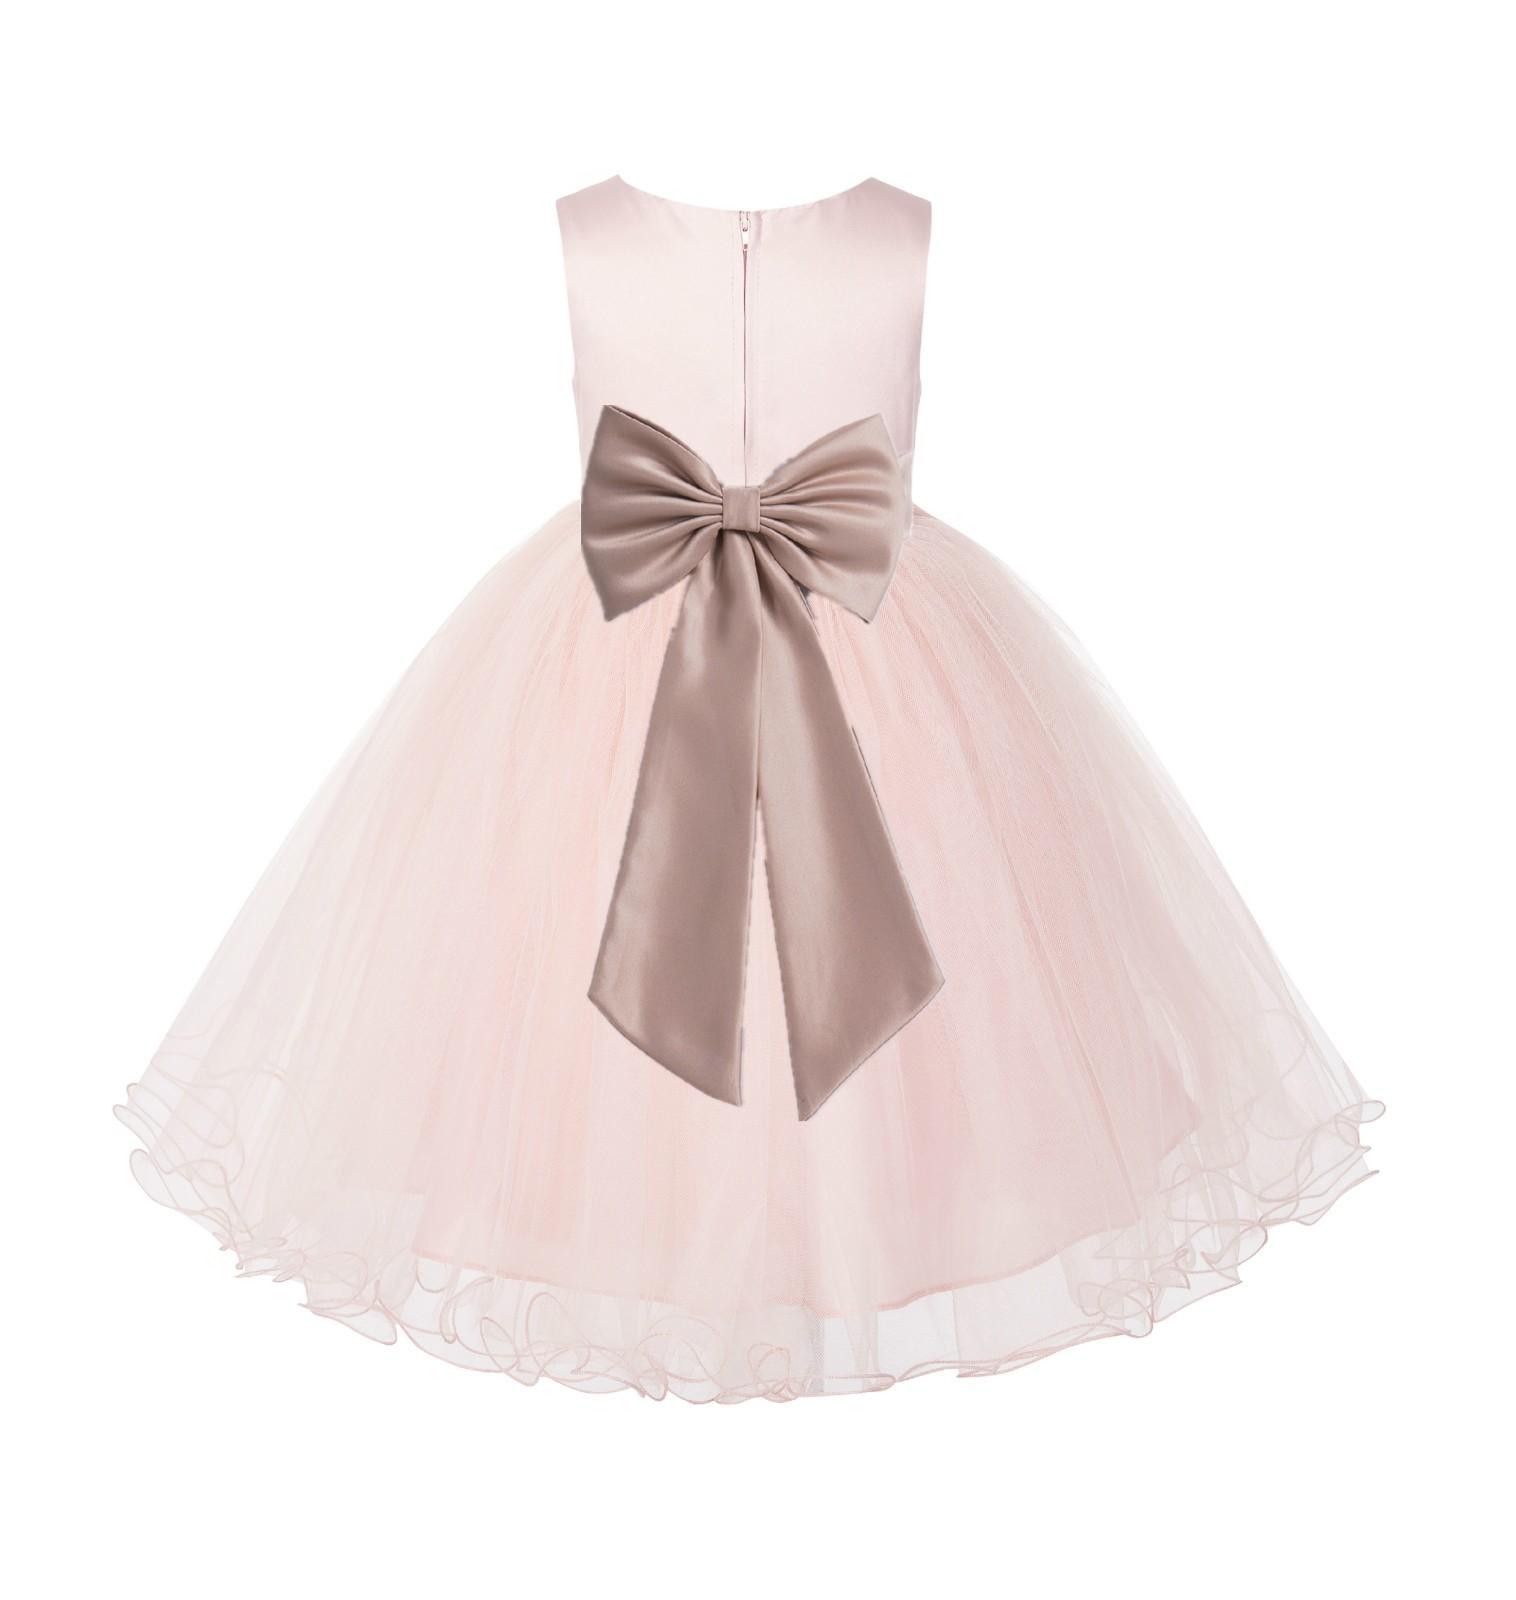 Blush PInk / Rose Gold Tulle Rattail Edge Flower Girl Dress Wedding Bridesmaid 829T